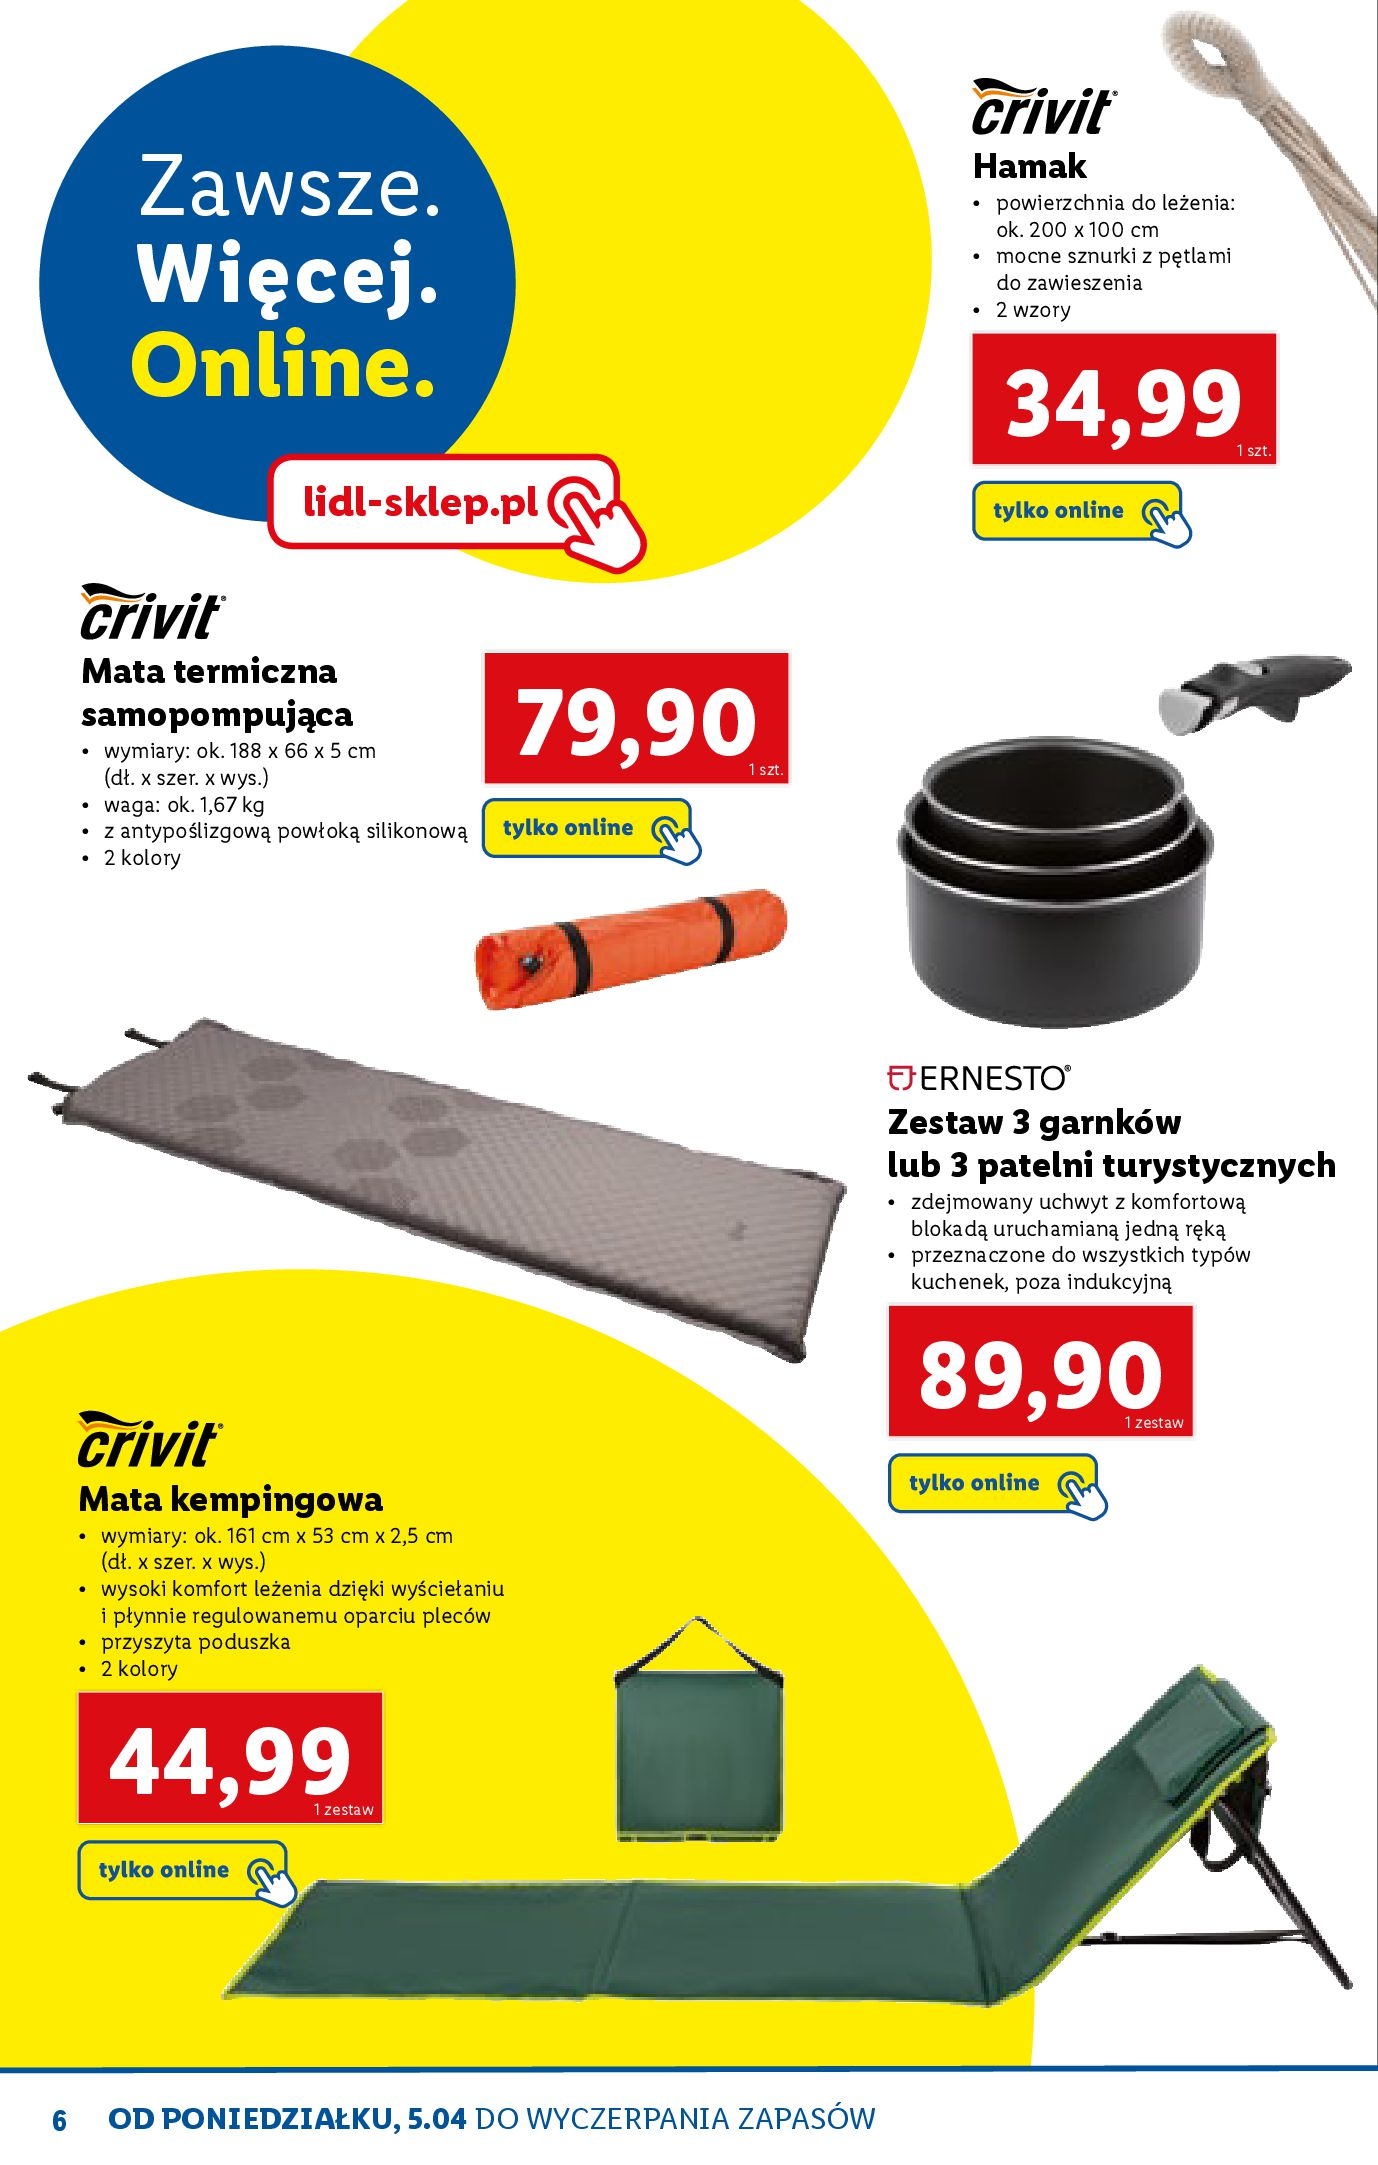 Gazetka Lidl: Katalog ONLINE - Rekreacja 2021-04-07 page-6